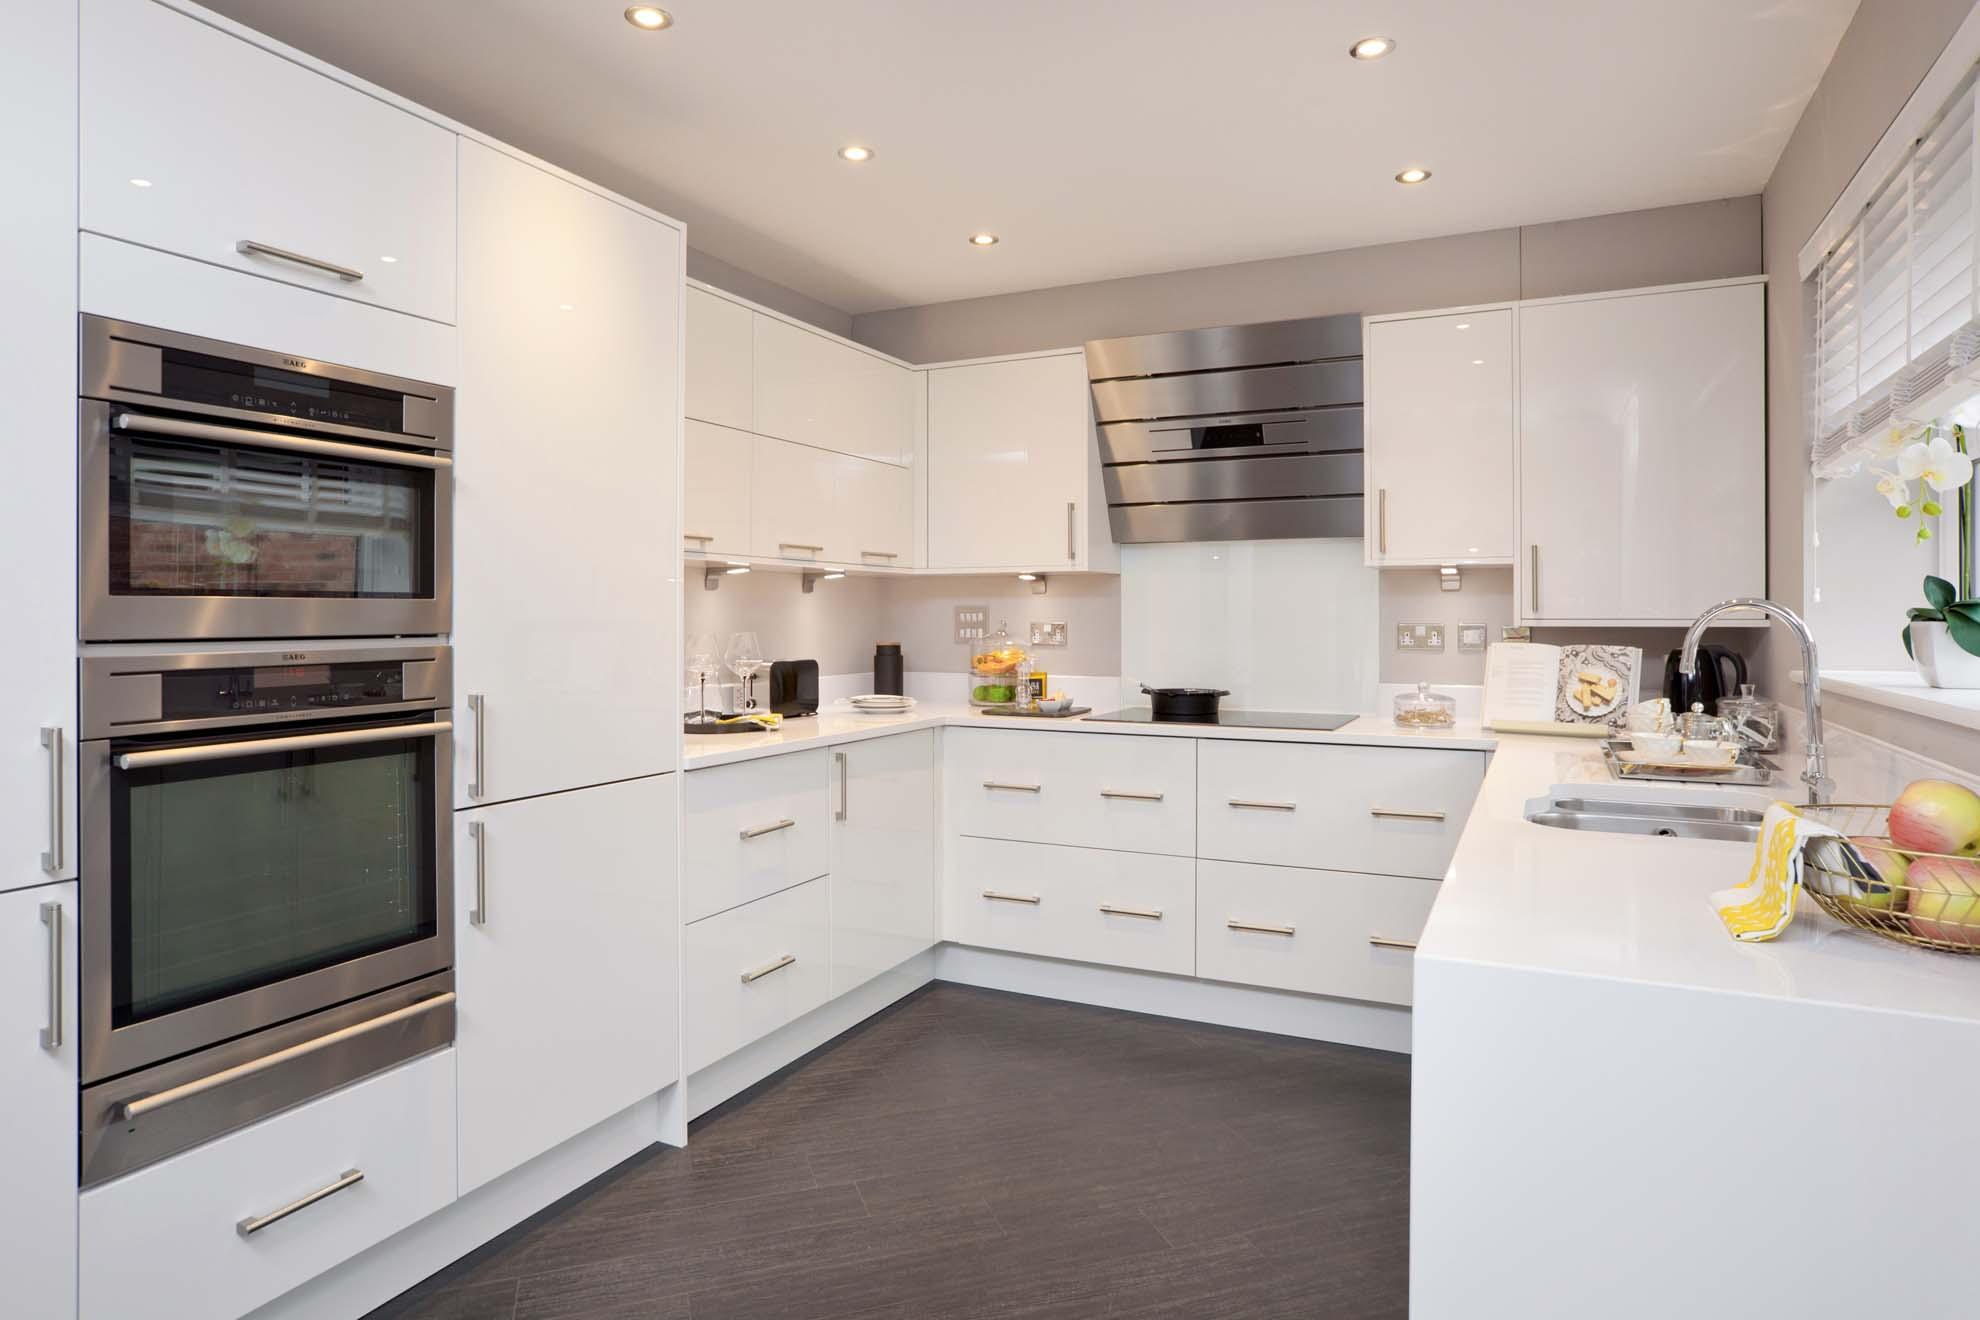 Gallery - Roundel Kitchens